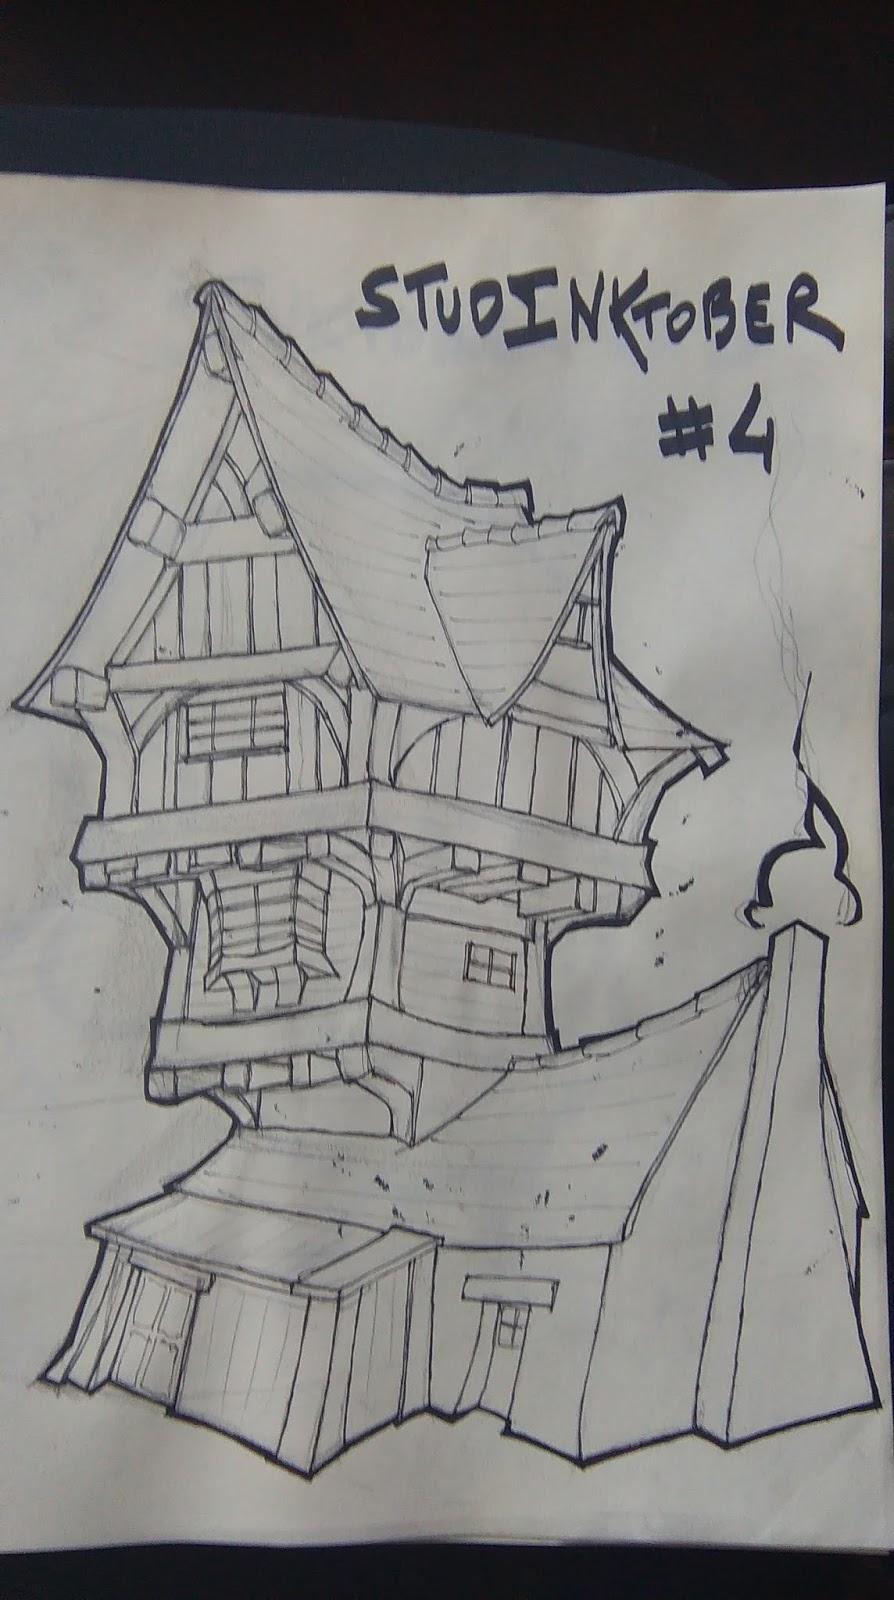 [SPOLYK] - Geometries & sketches IMAG0009